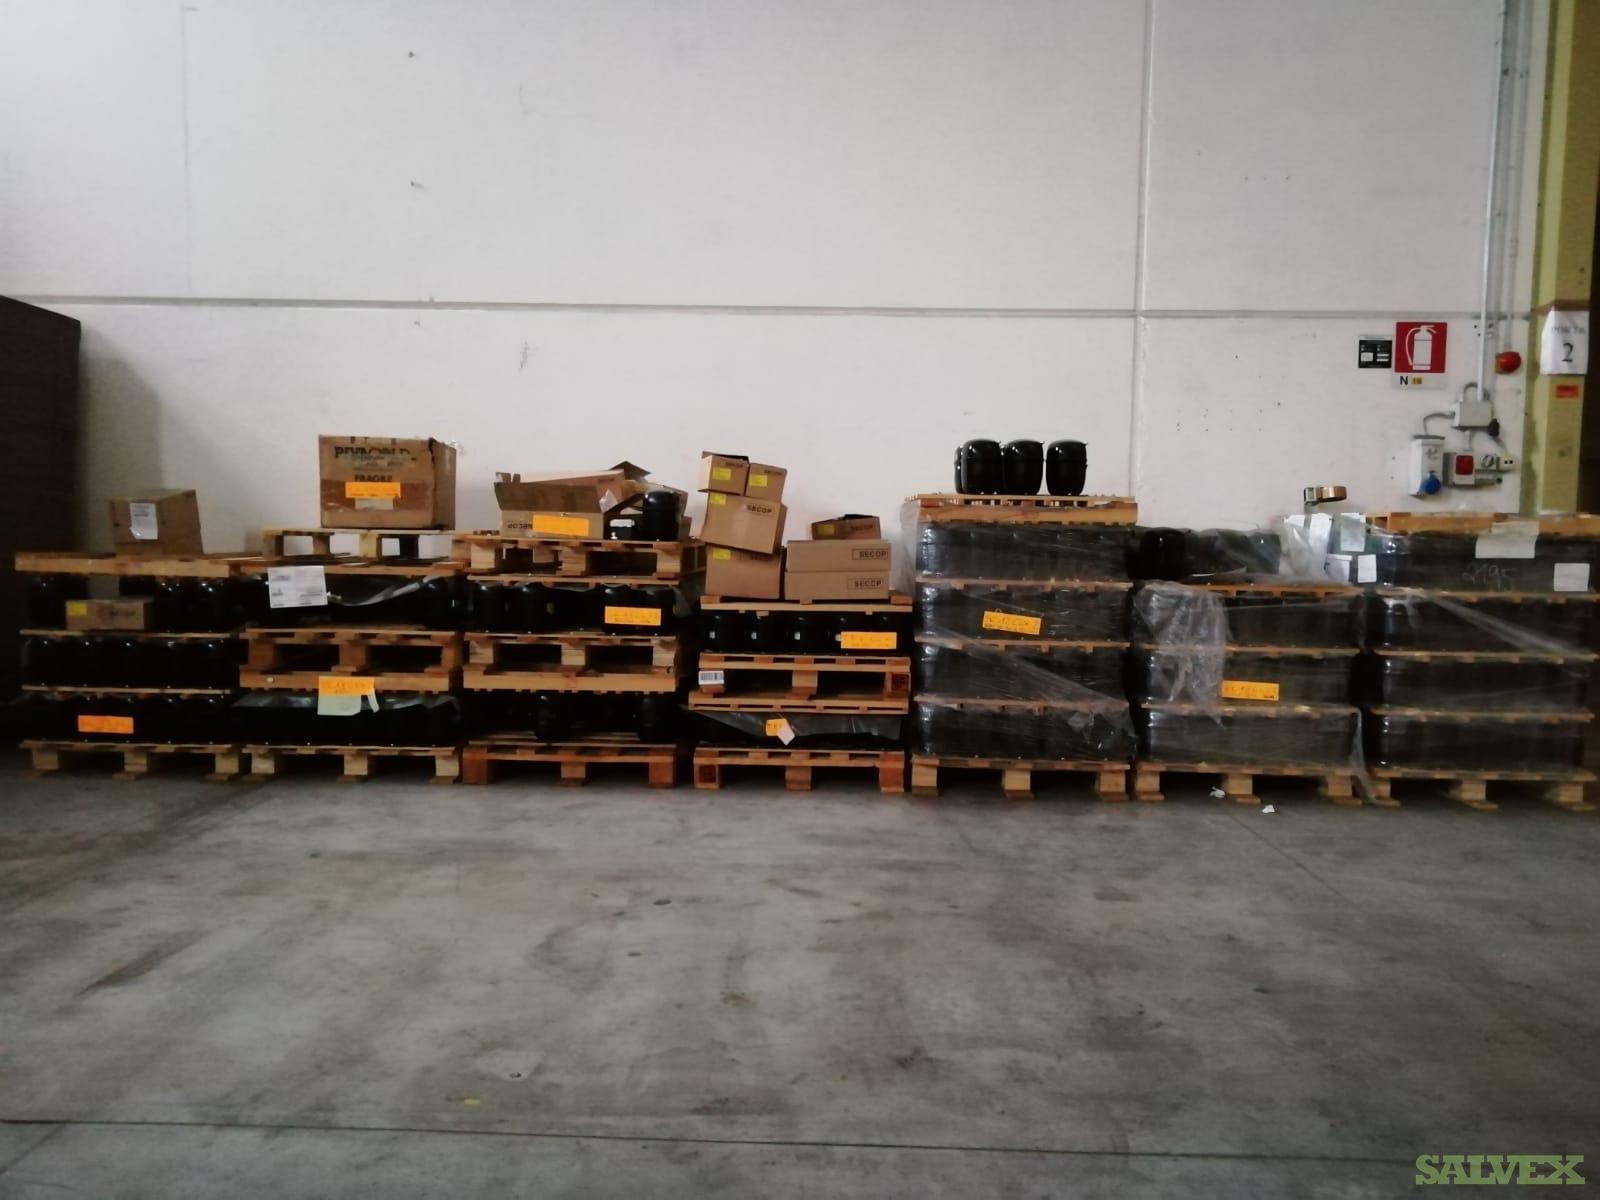 SECOP/EMBRACO Refrigeration Compressors R404A-R507-R452A (397 Units) and Spare Parts (190 Units)